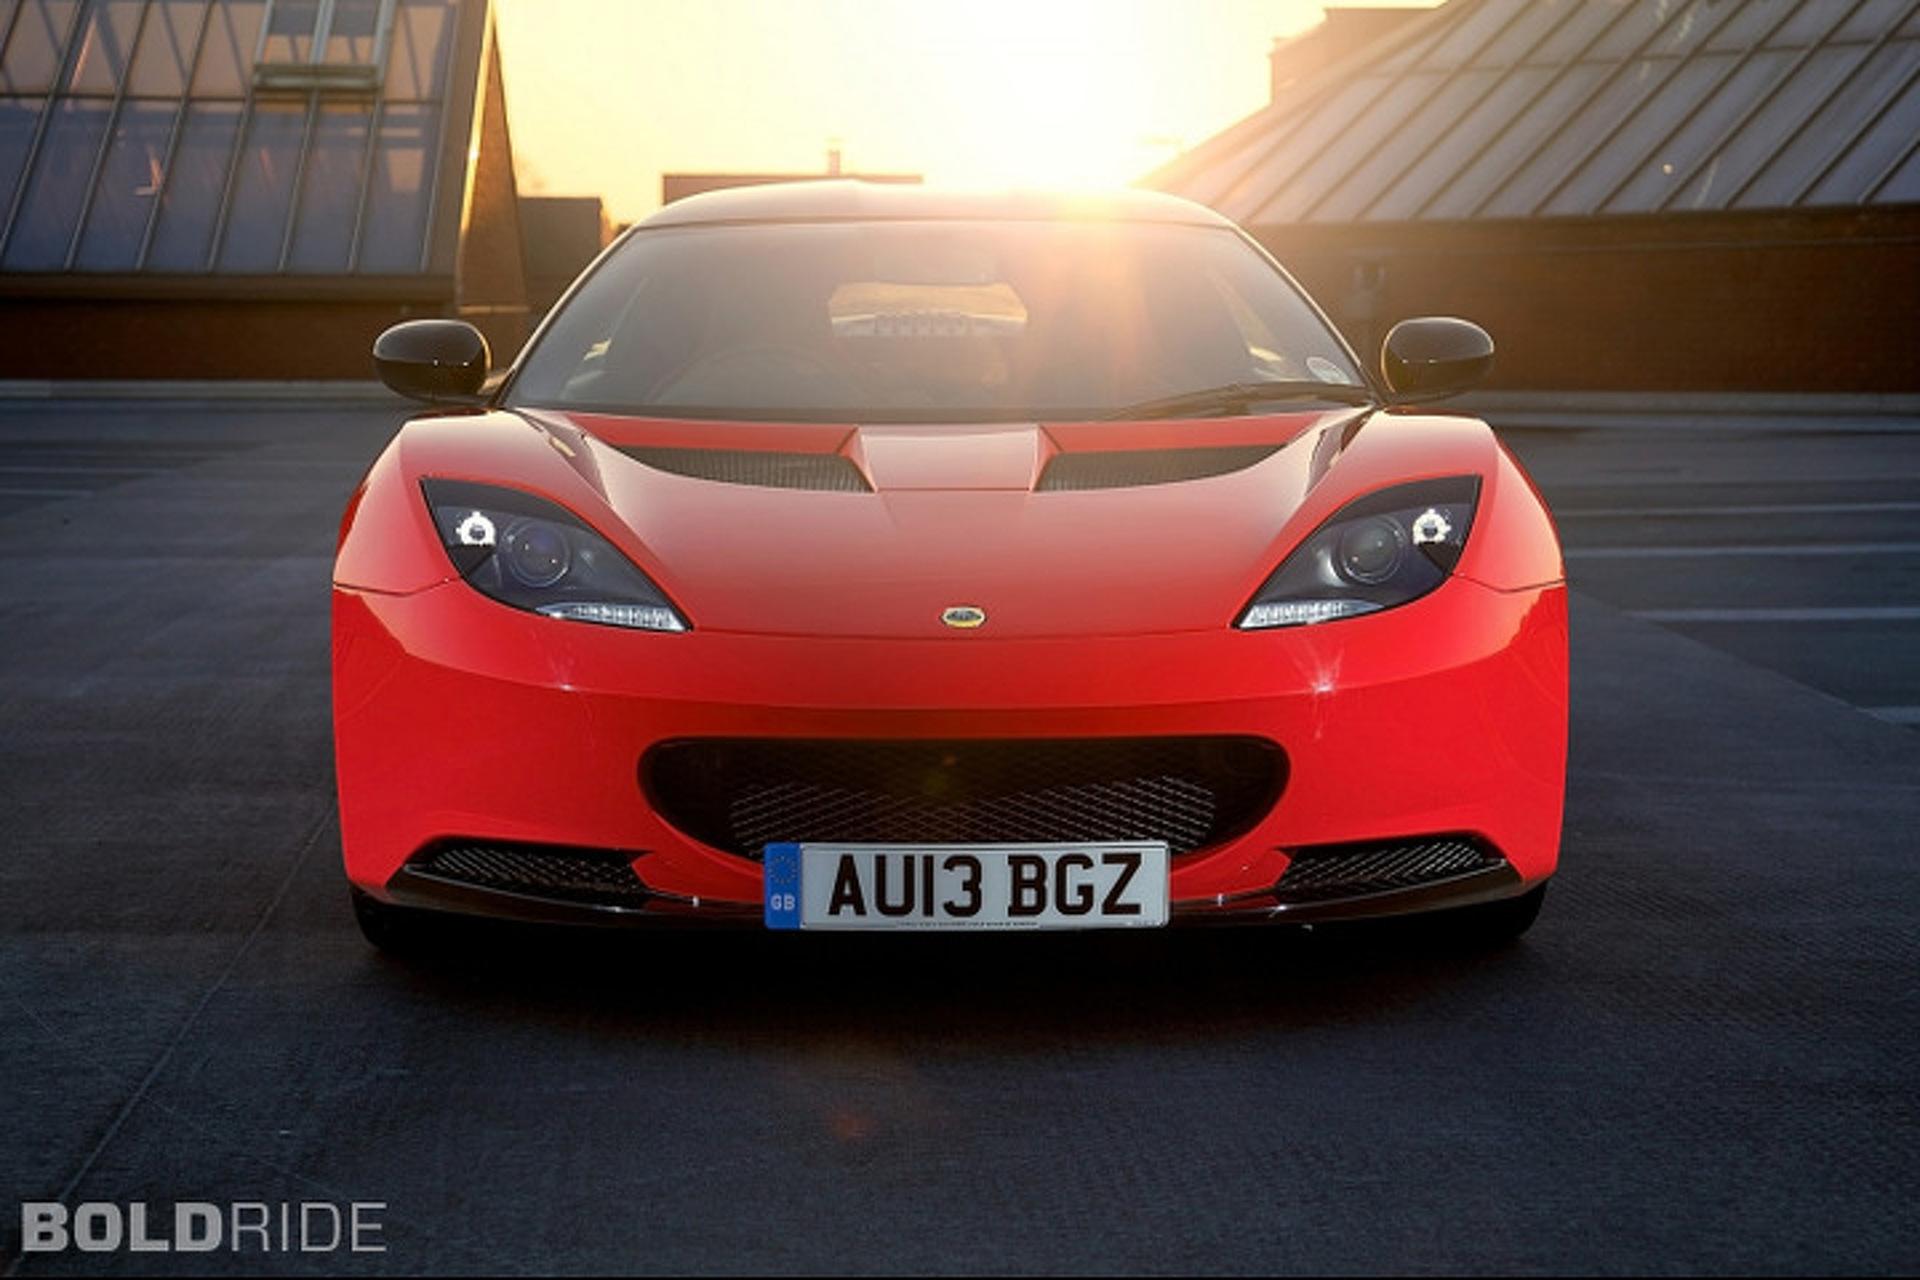 U.K. Sportscar Company Lotus Appoints New CEO